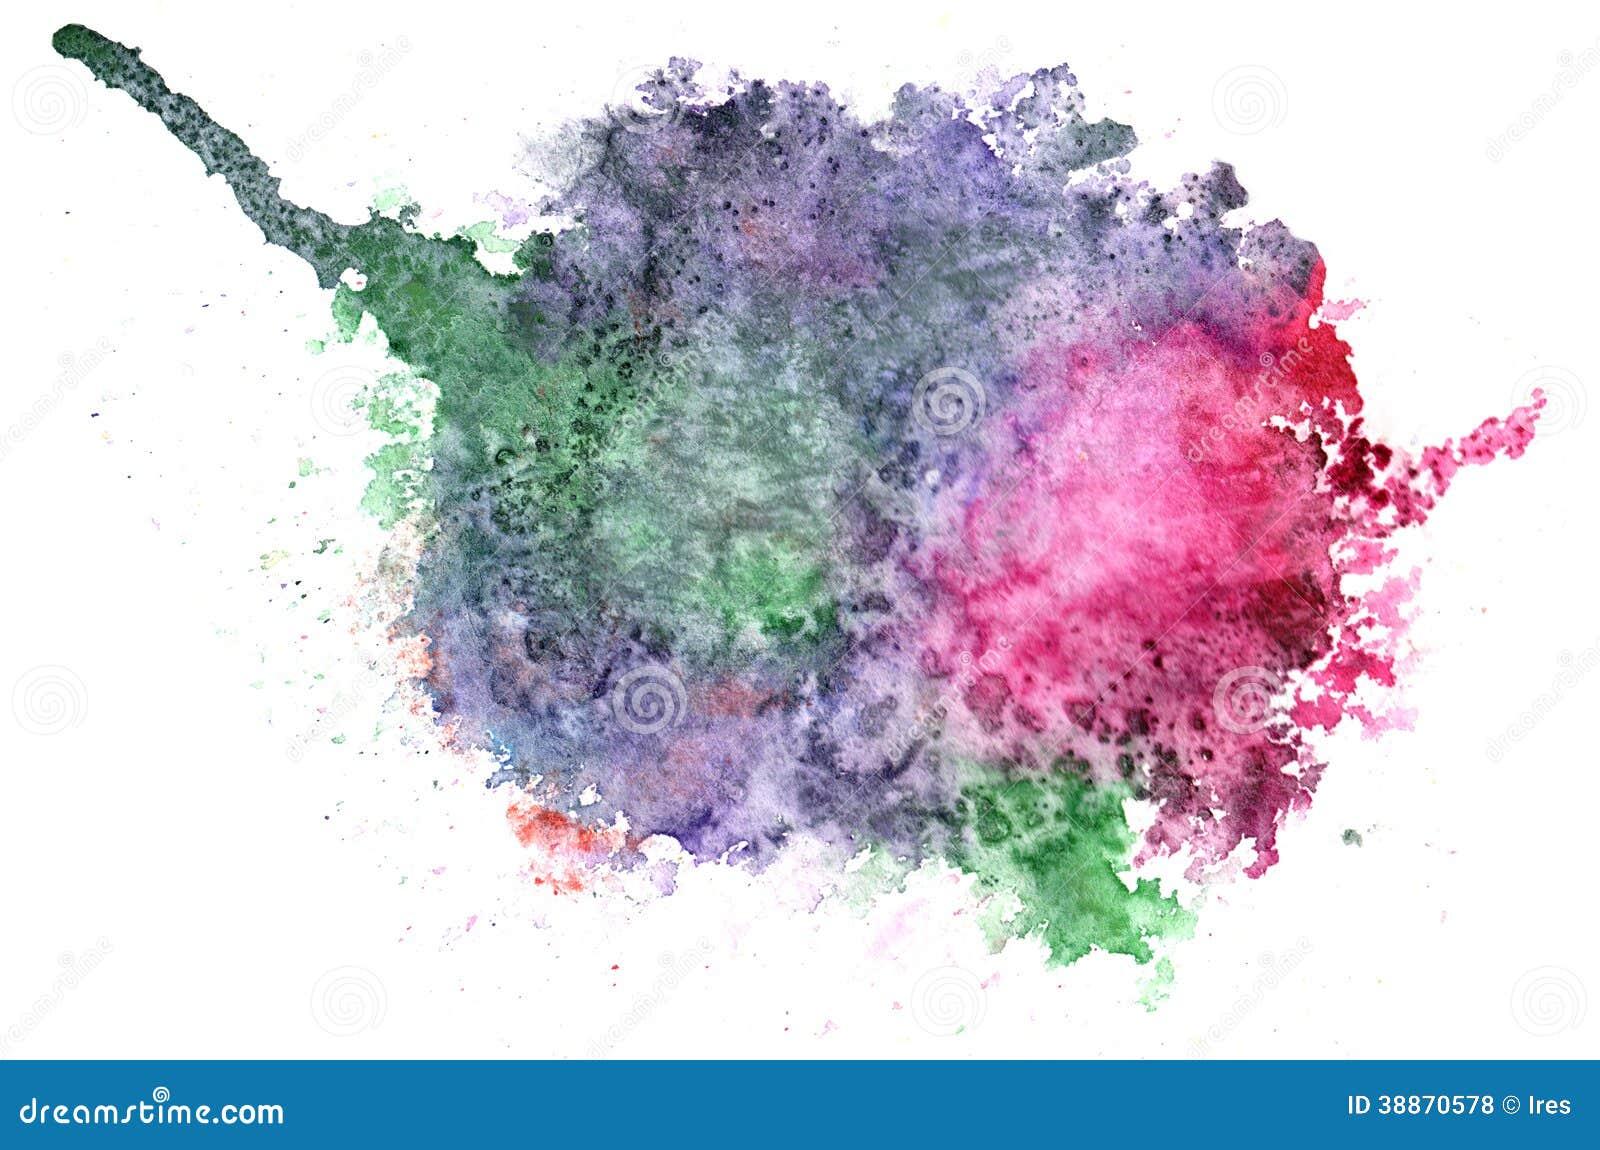 Abstract watercolor aquarelle hand drawn blot colorful ...  Colorful Watercolor Splash